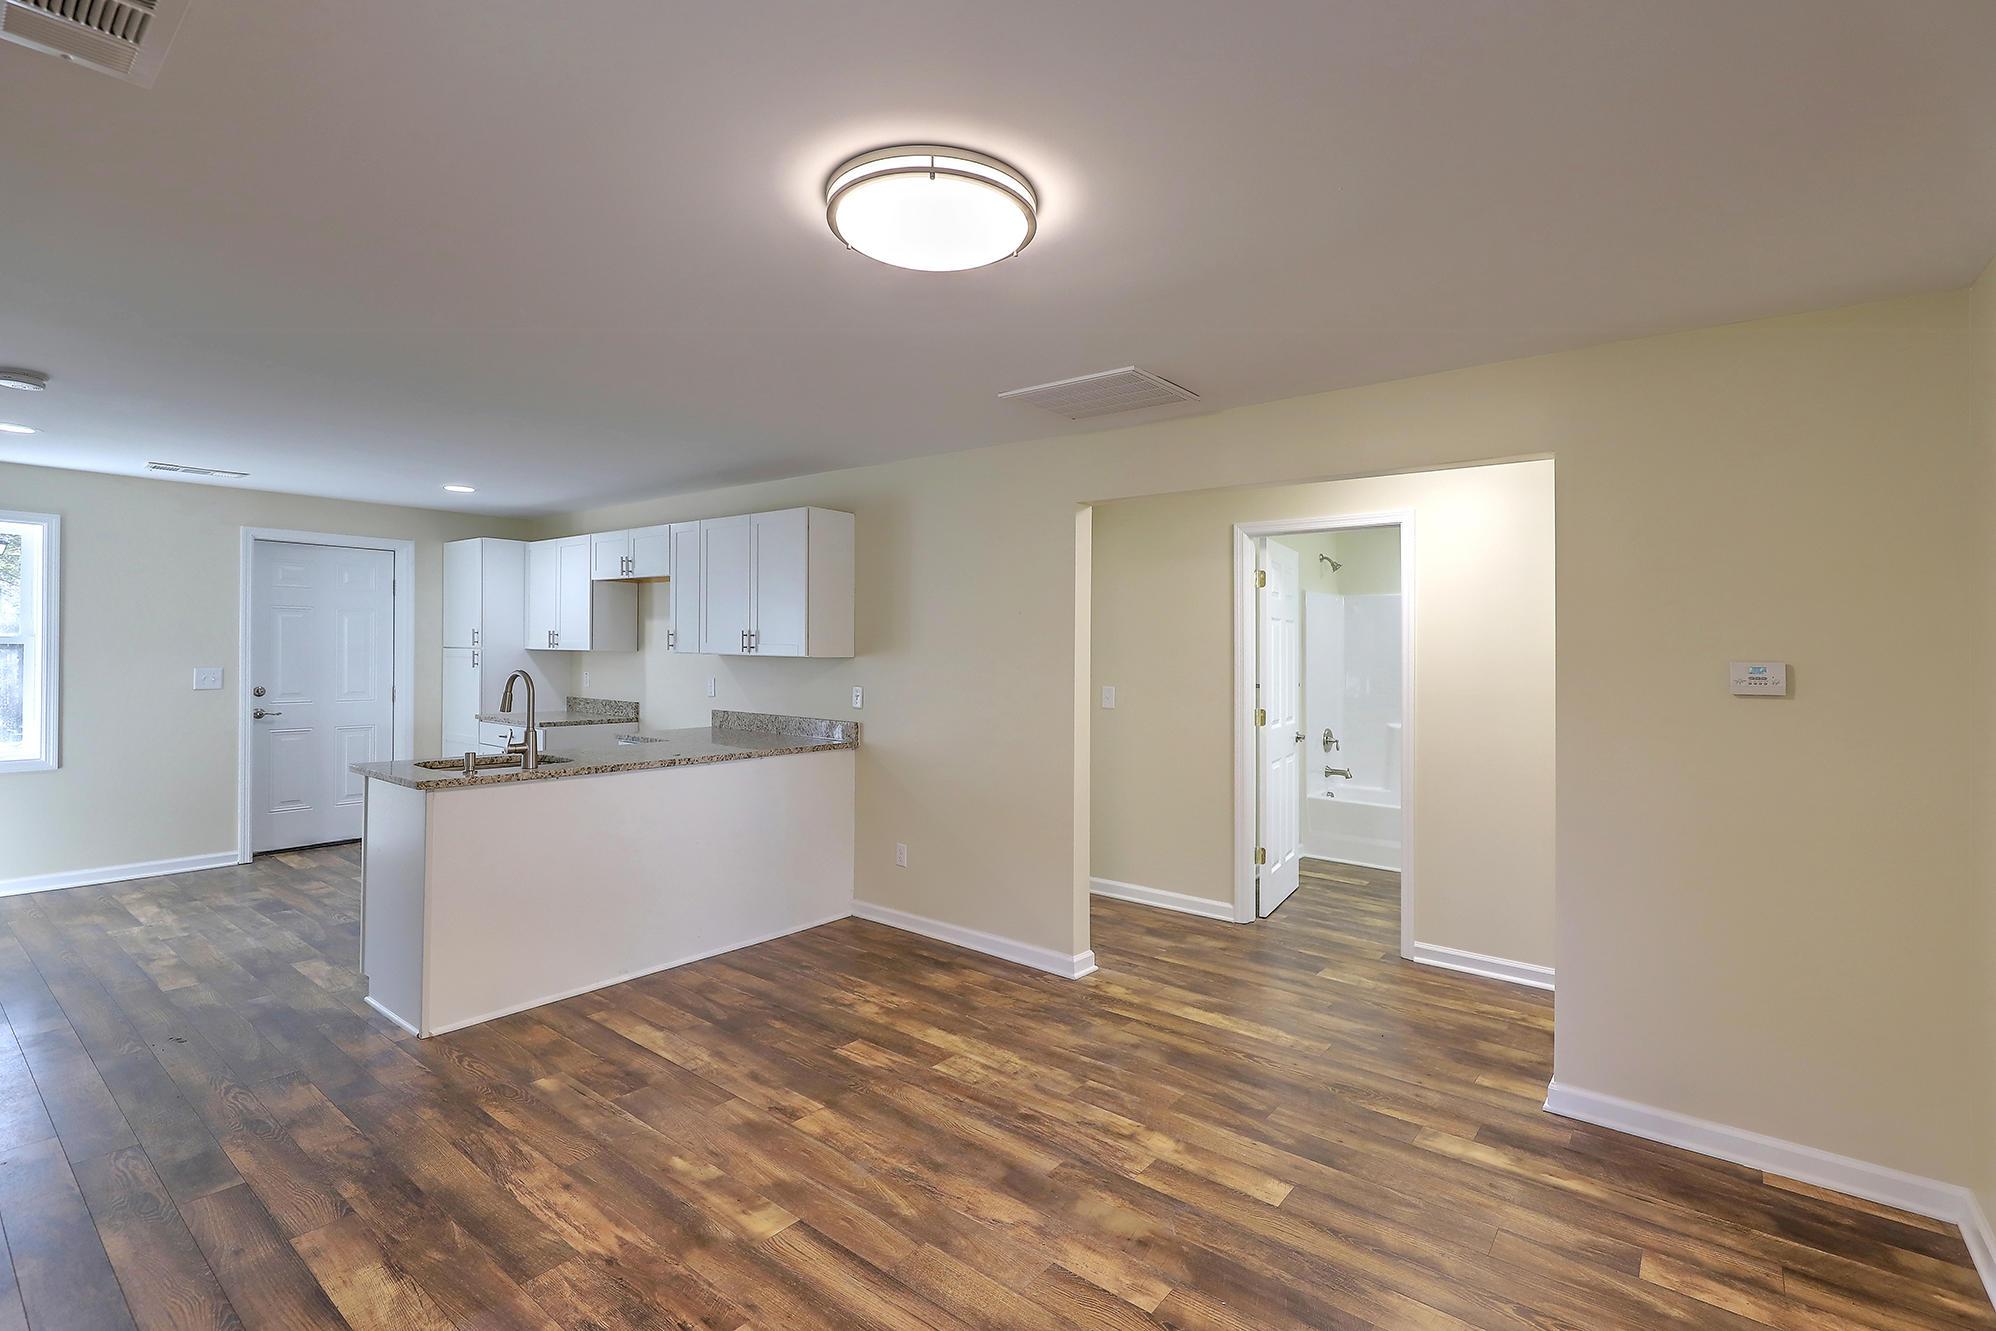 Liberty Hill Homes For Sale - 4876 Upjohn, North Charleston, SC - 9